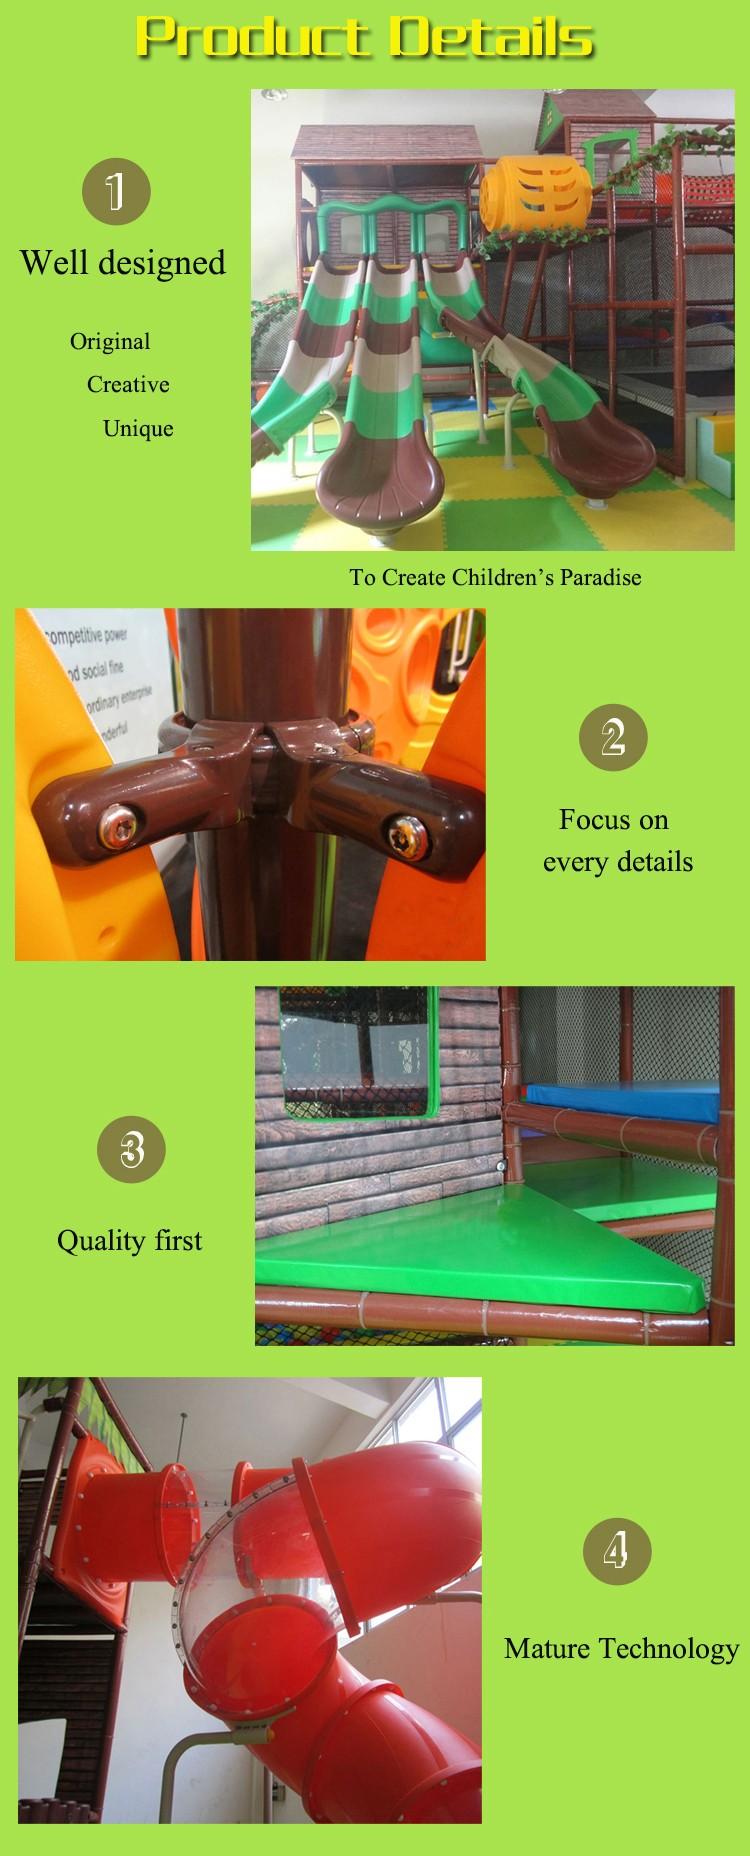 Ihram Kids For Sale Dubai: Soft Foam Kids Plastic Indoor Playground Equipment Toys